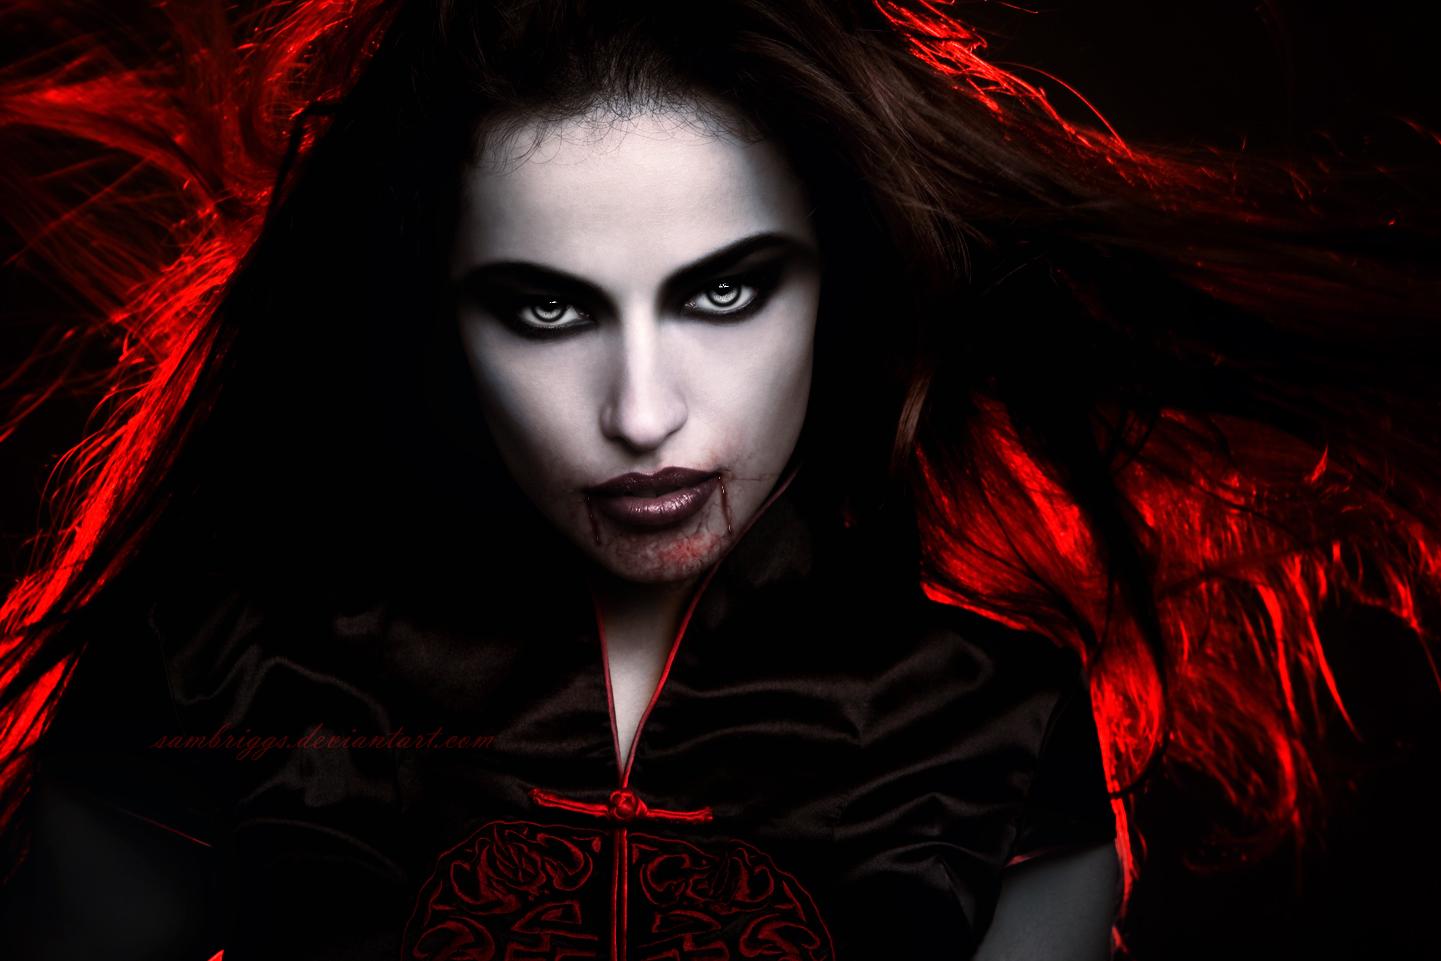 Vampire Beauty XXIII by SamBriggs